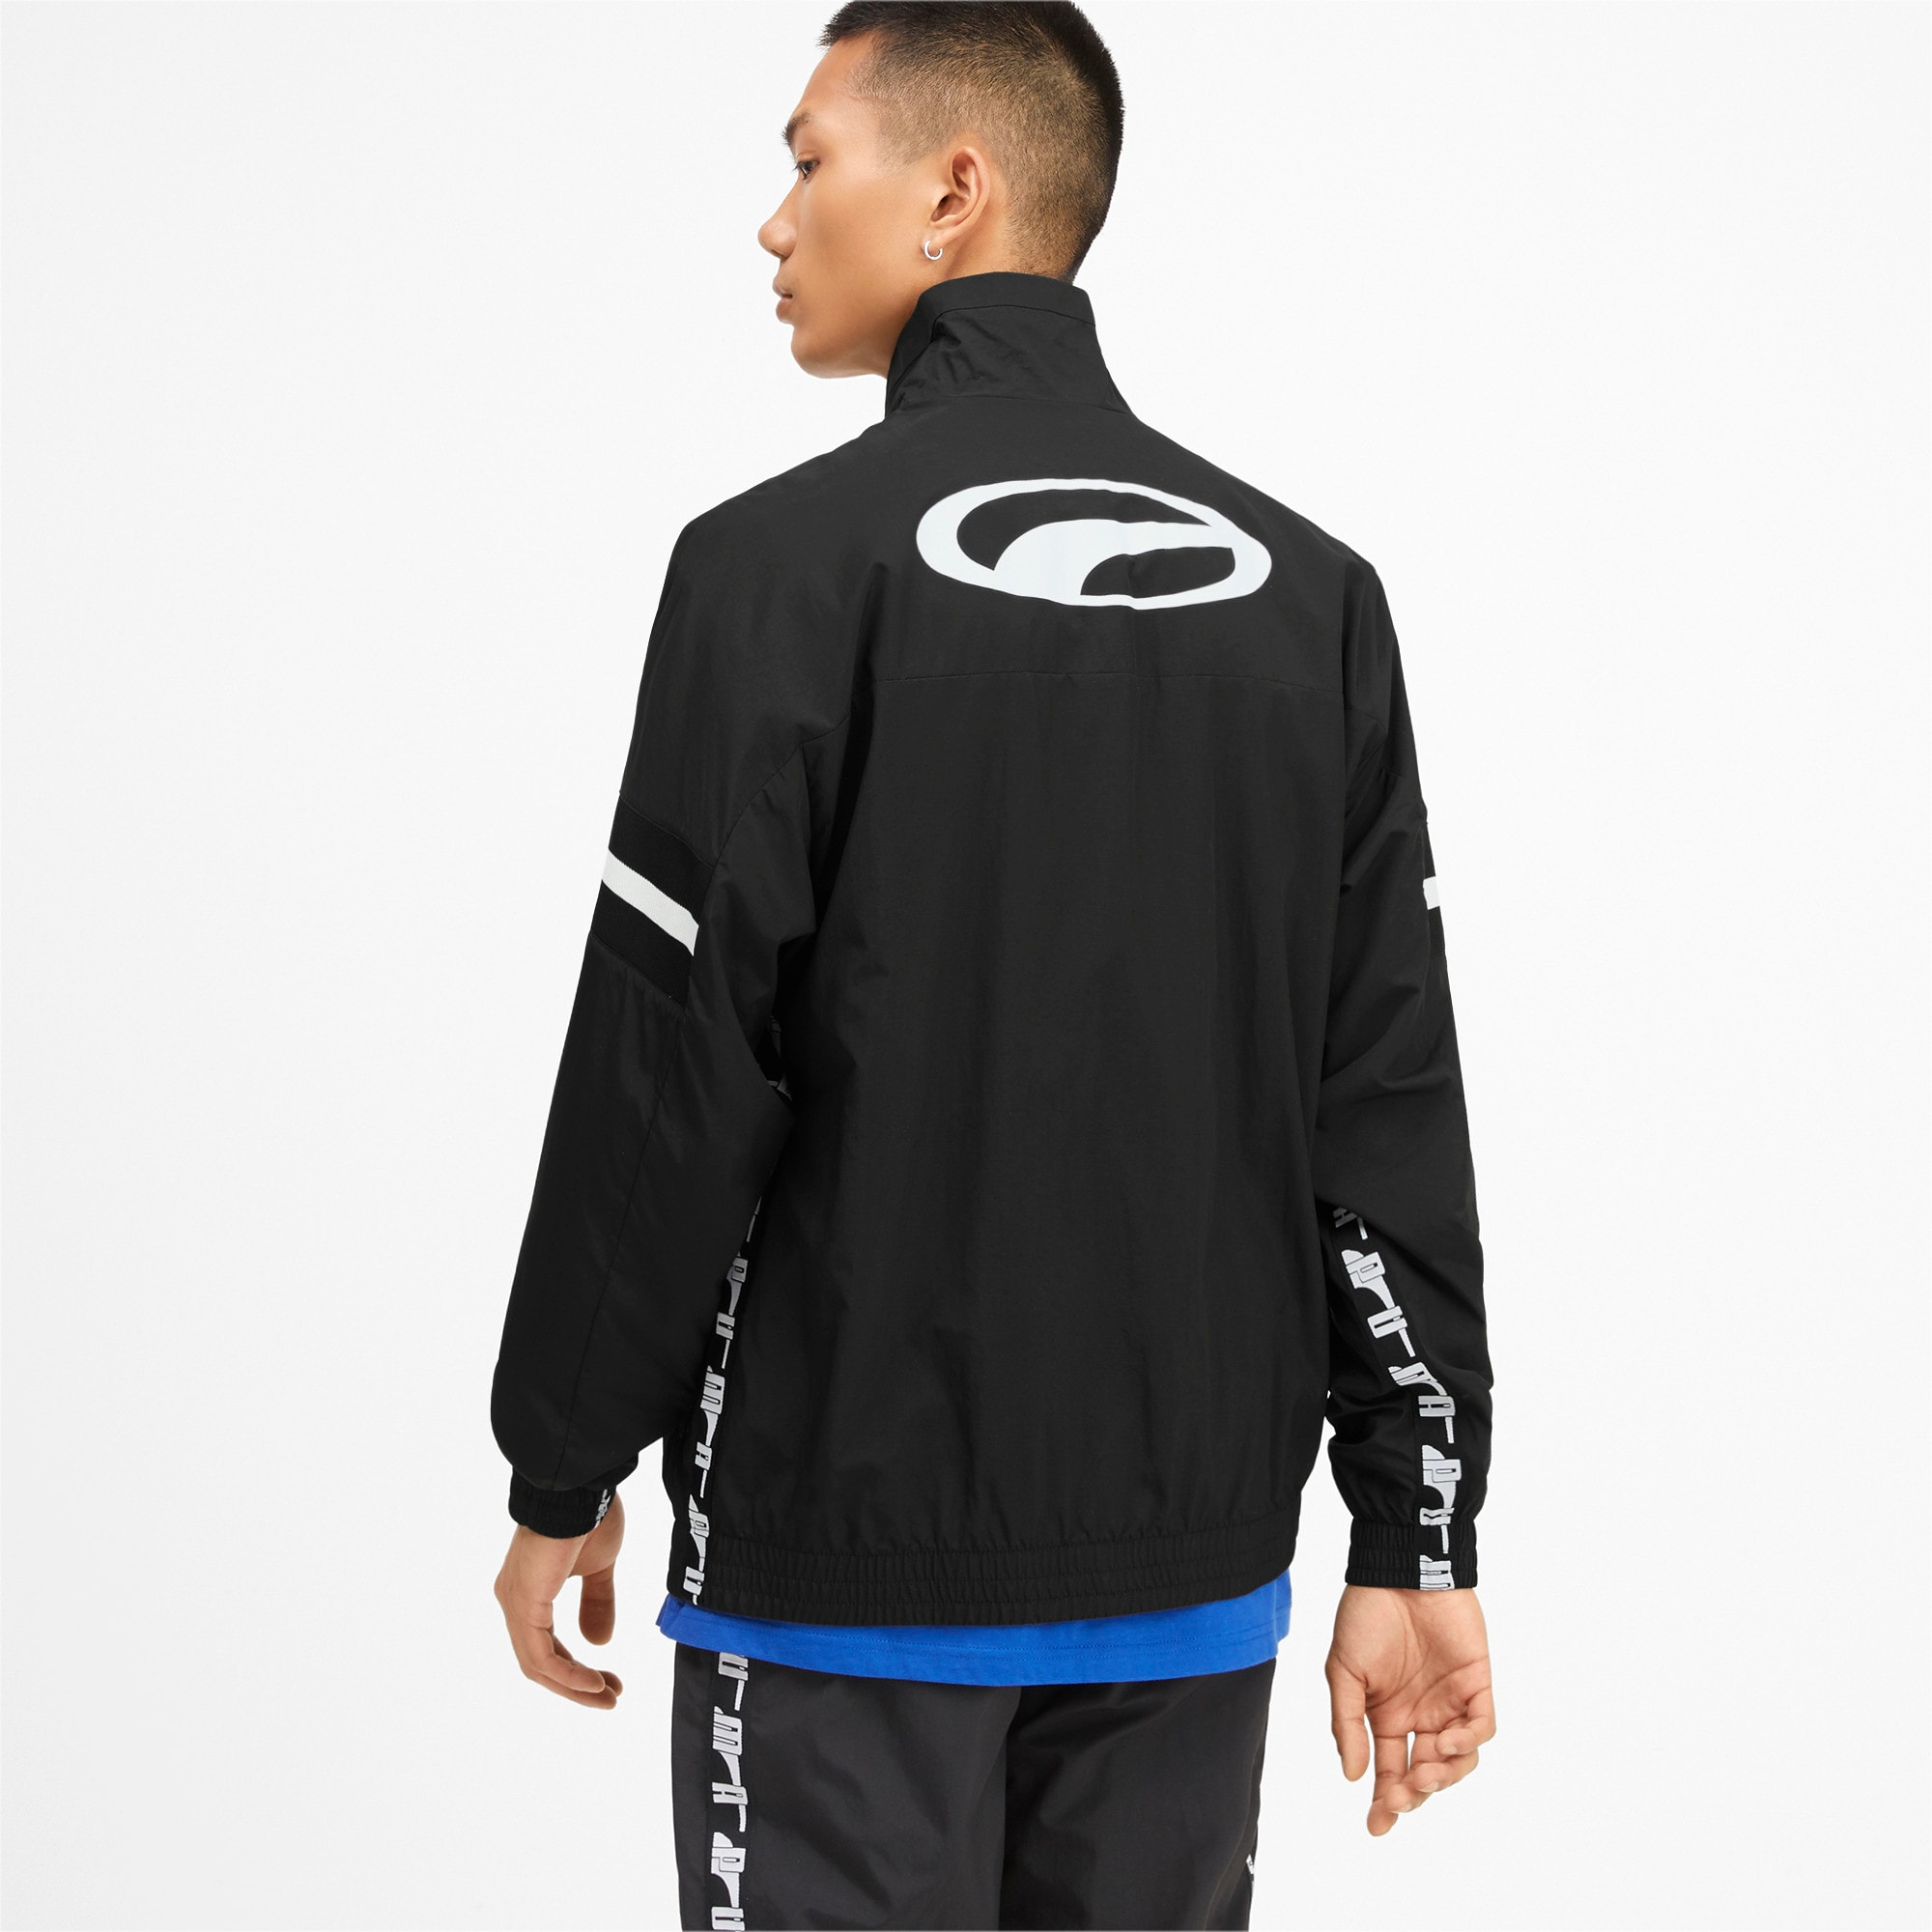 Thumbnail 2 of PUMA XTG Men's Woven Jacket, Puma Black, medium